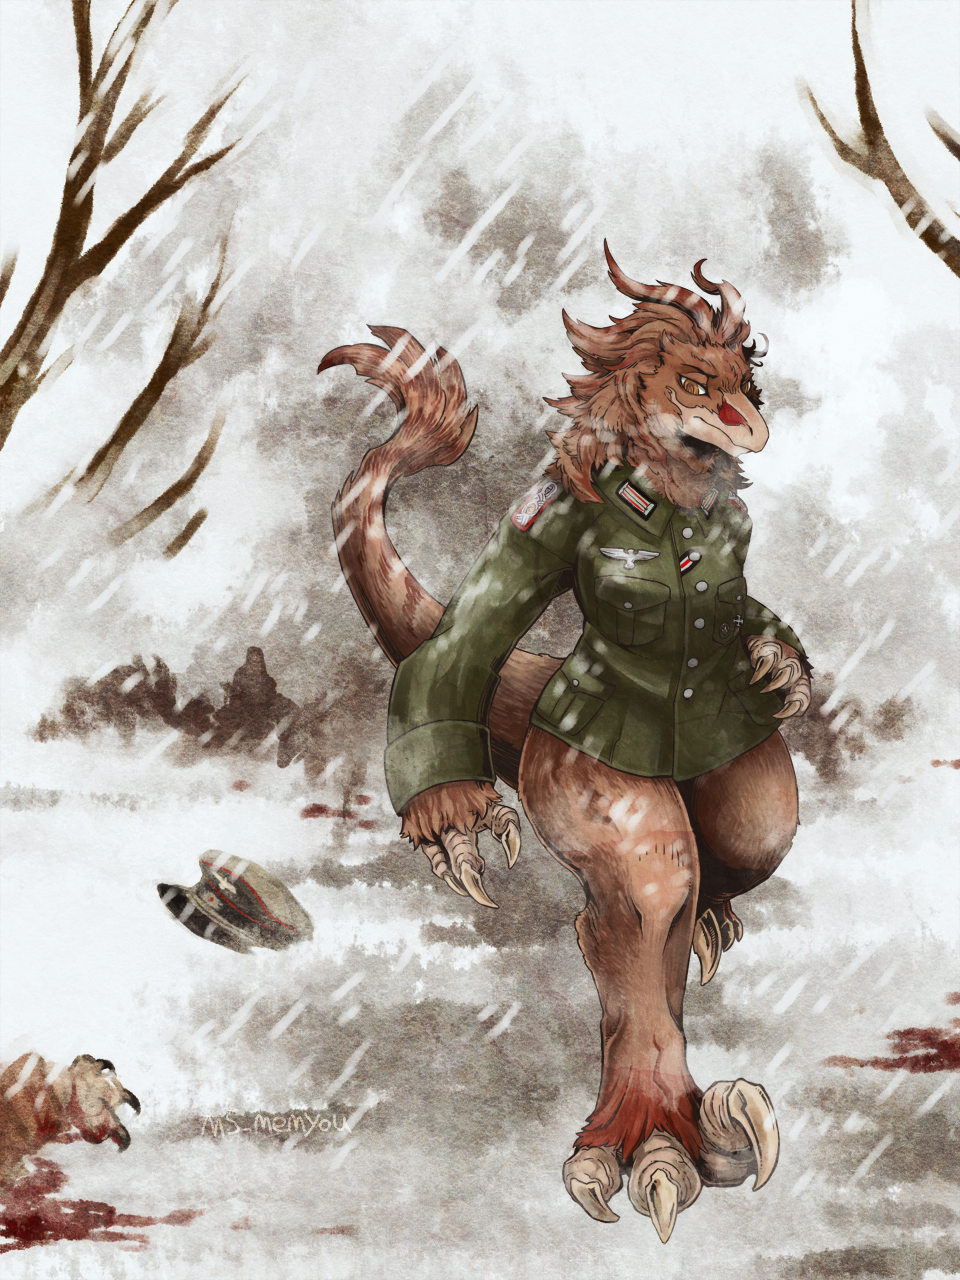 [c] Through the Snow